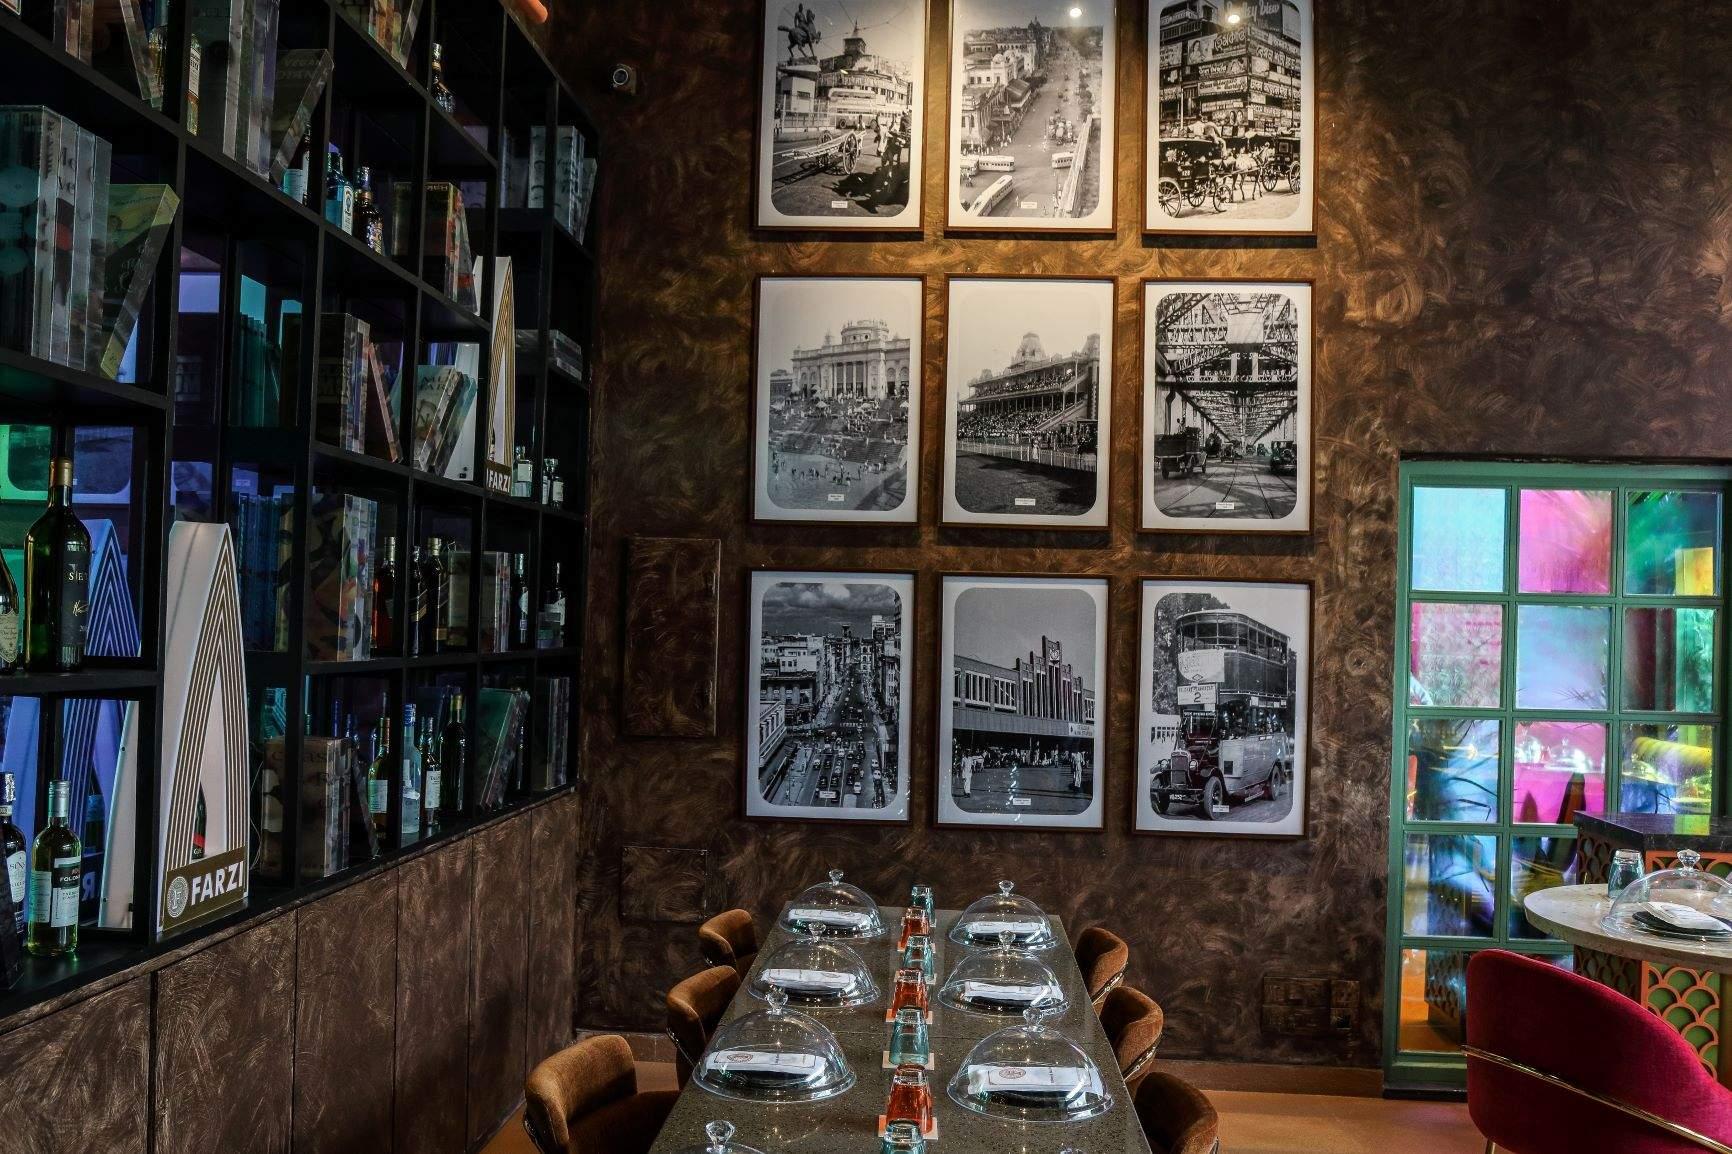 Interiors of Farzi Cafe Kolkata